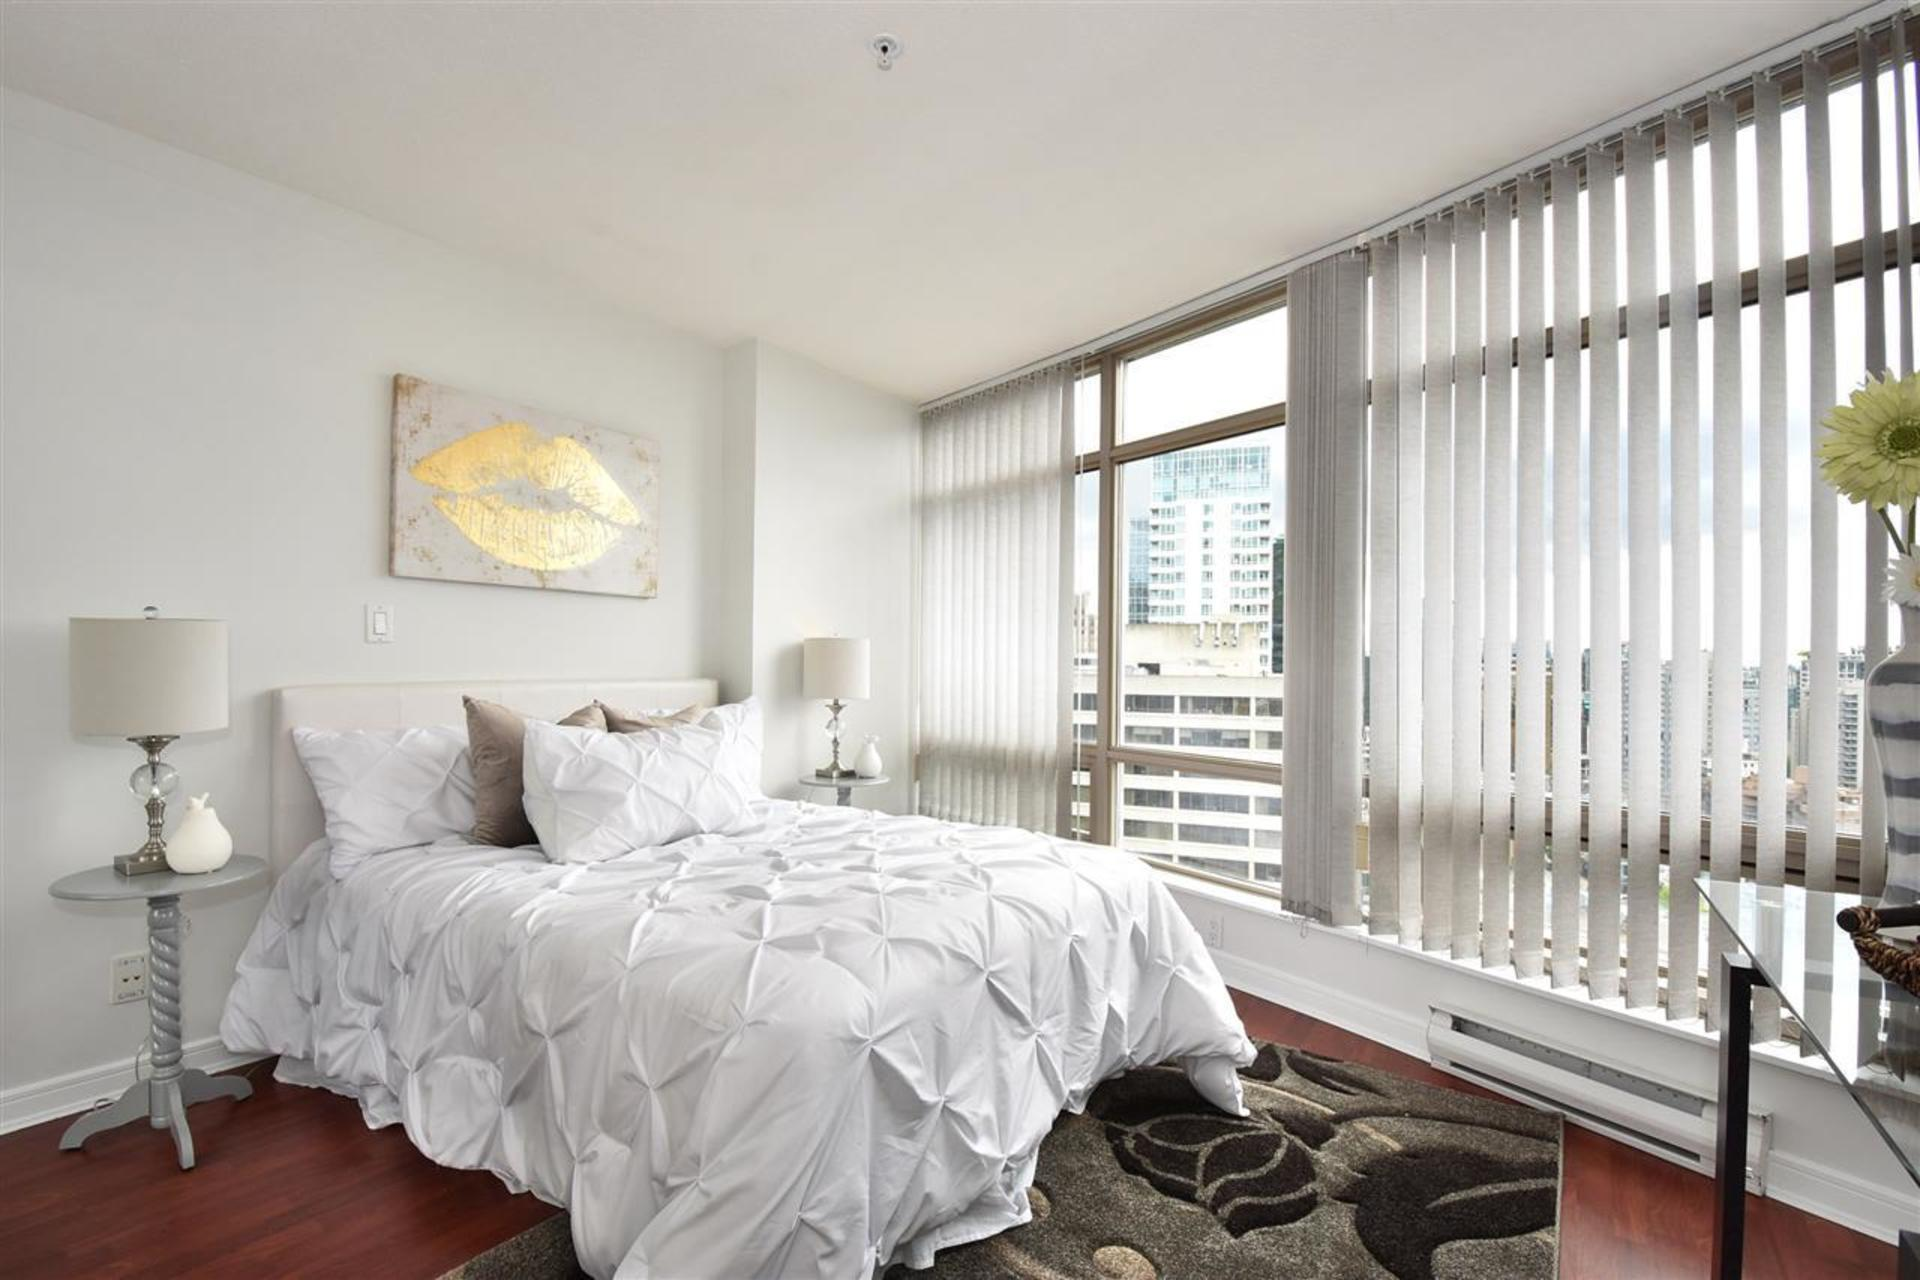 1200-alberni-street-west-end-vw-vancouver-west-11 at 2202 - 1200 Alberni Street, West End VW, Vancouver West